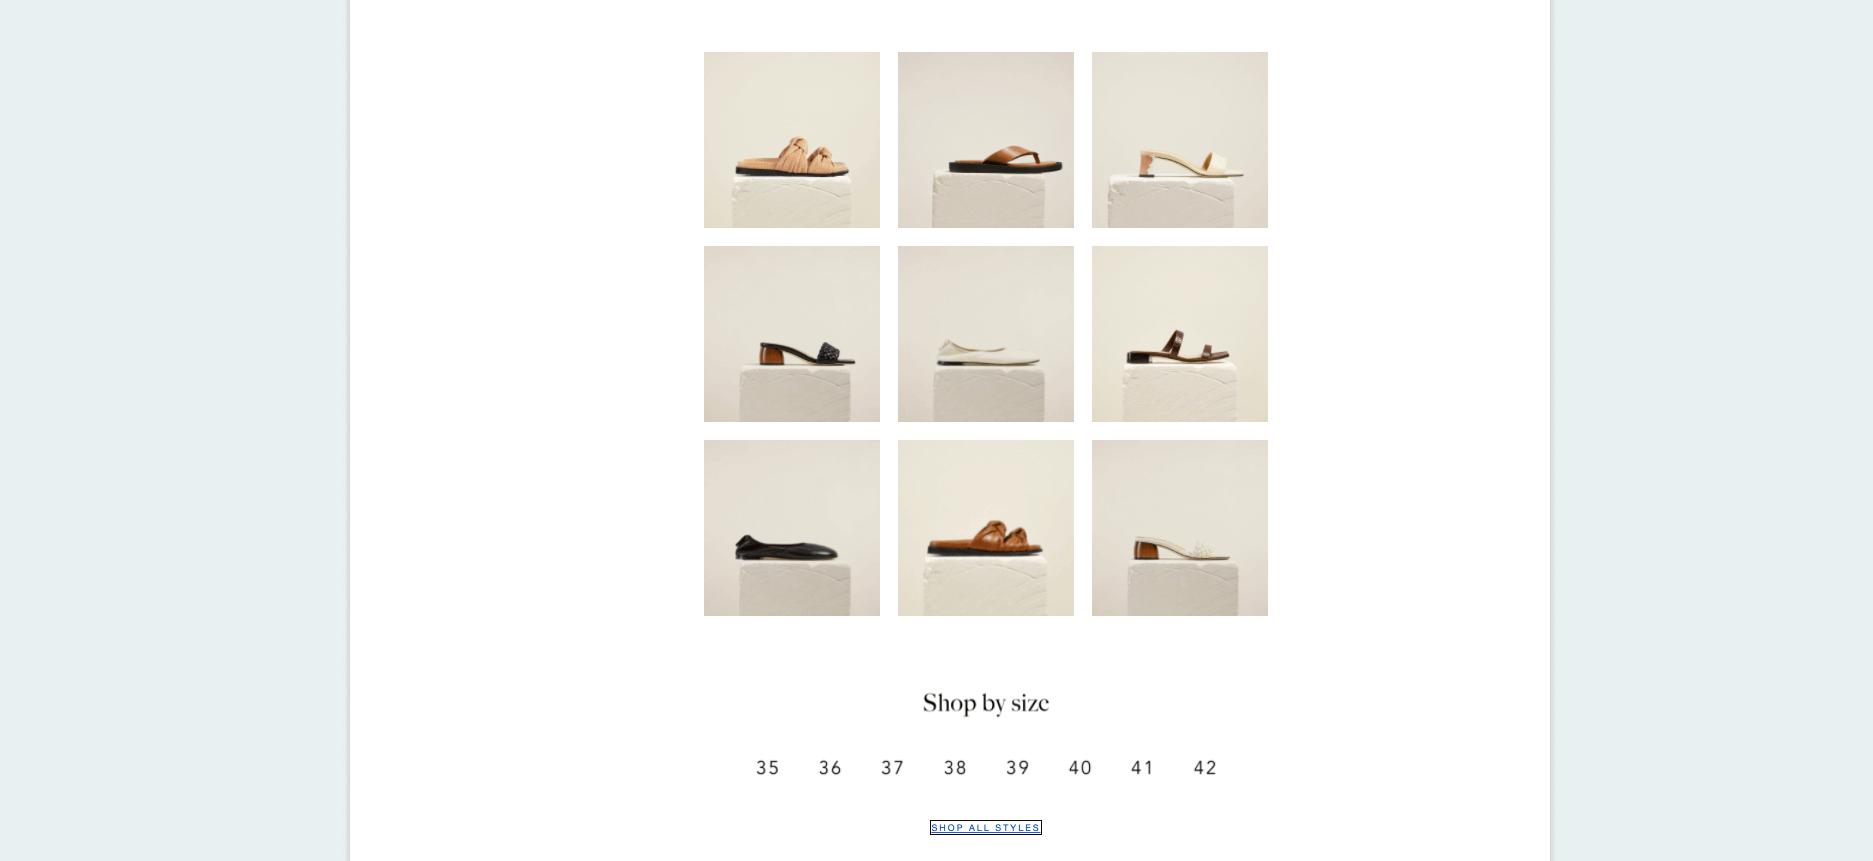 Dear Frances - Shop by size email